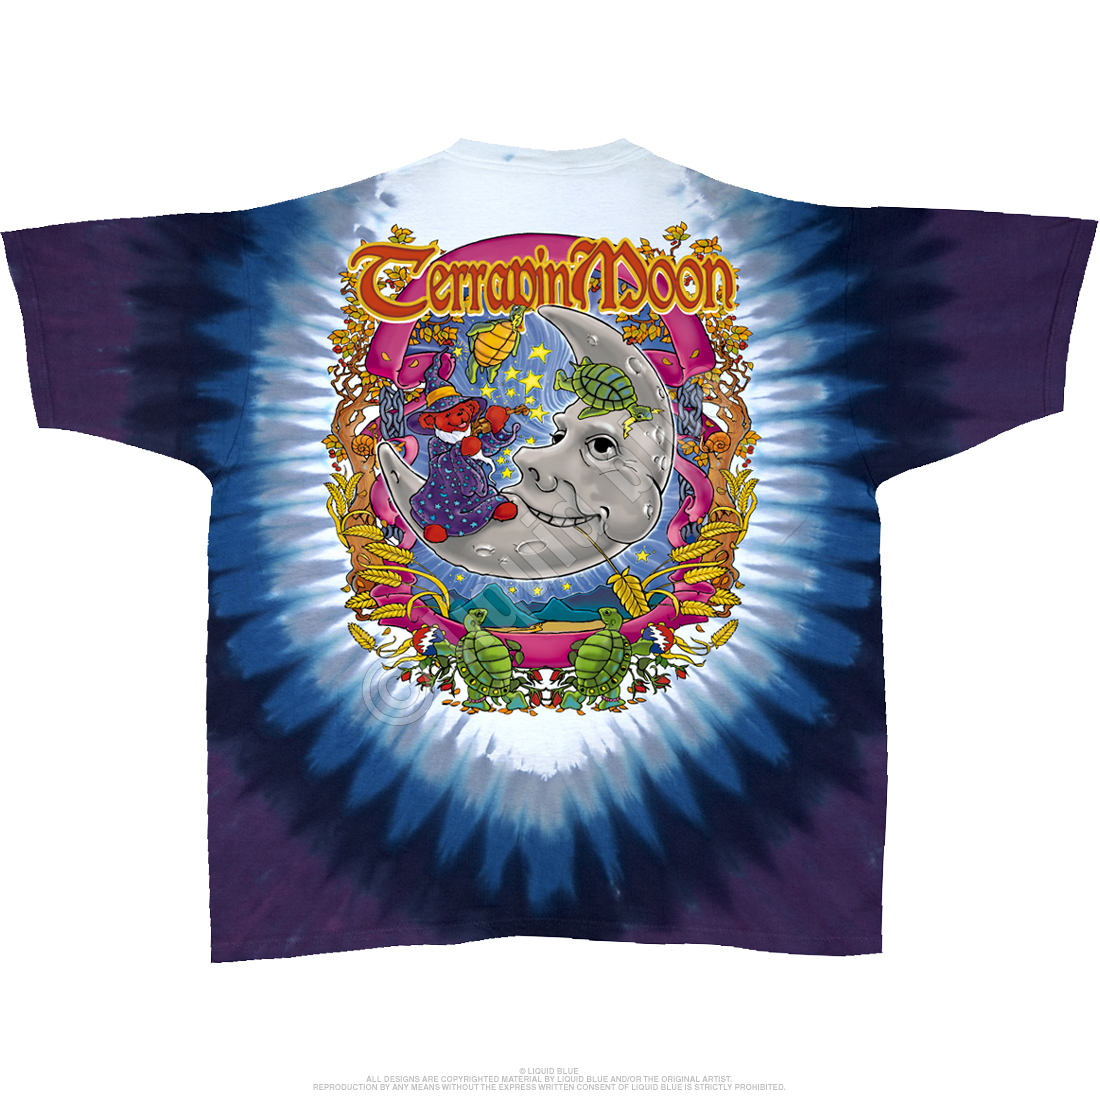 Terrapin Moon Tie-Dye T-Shirt